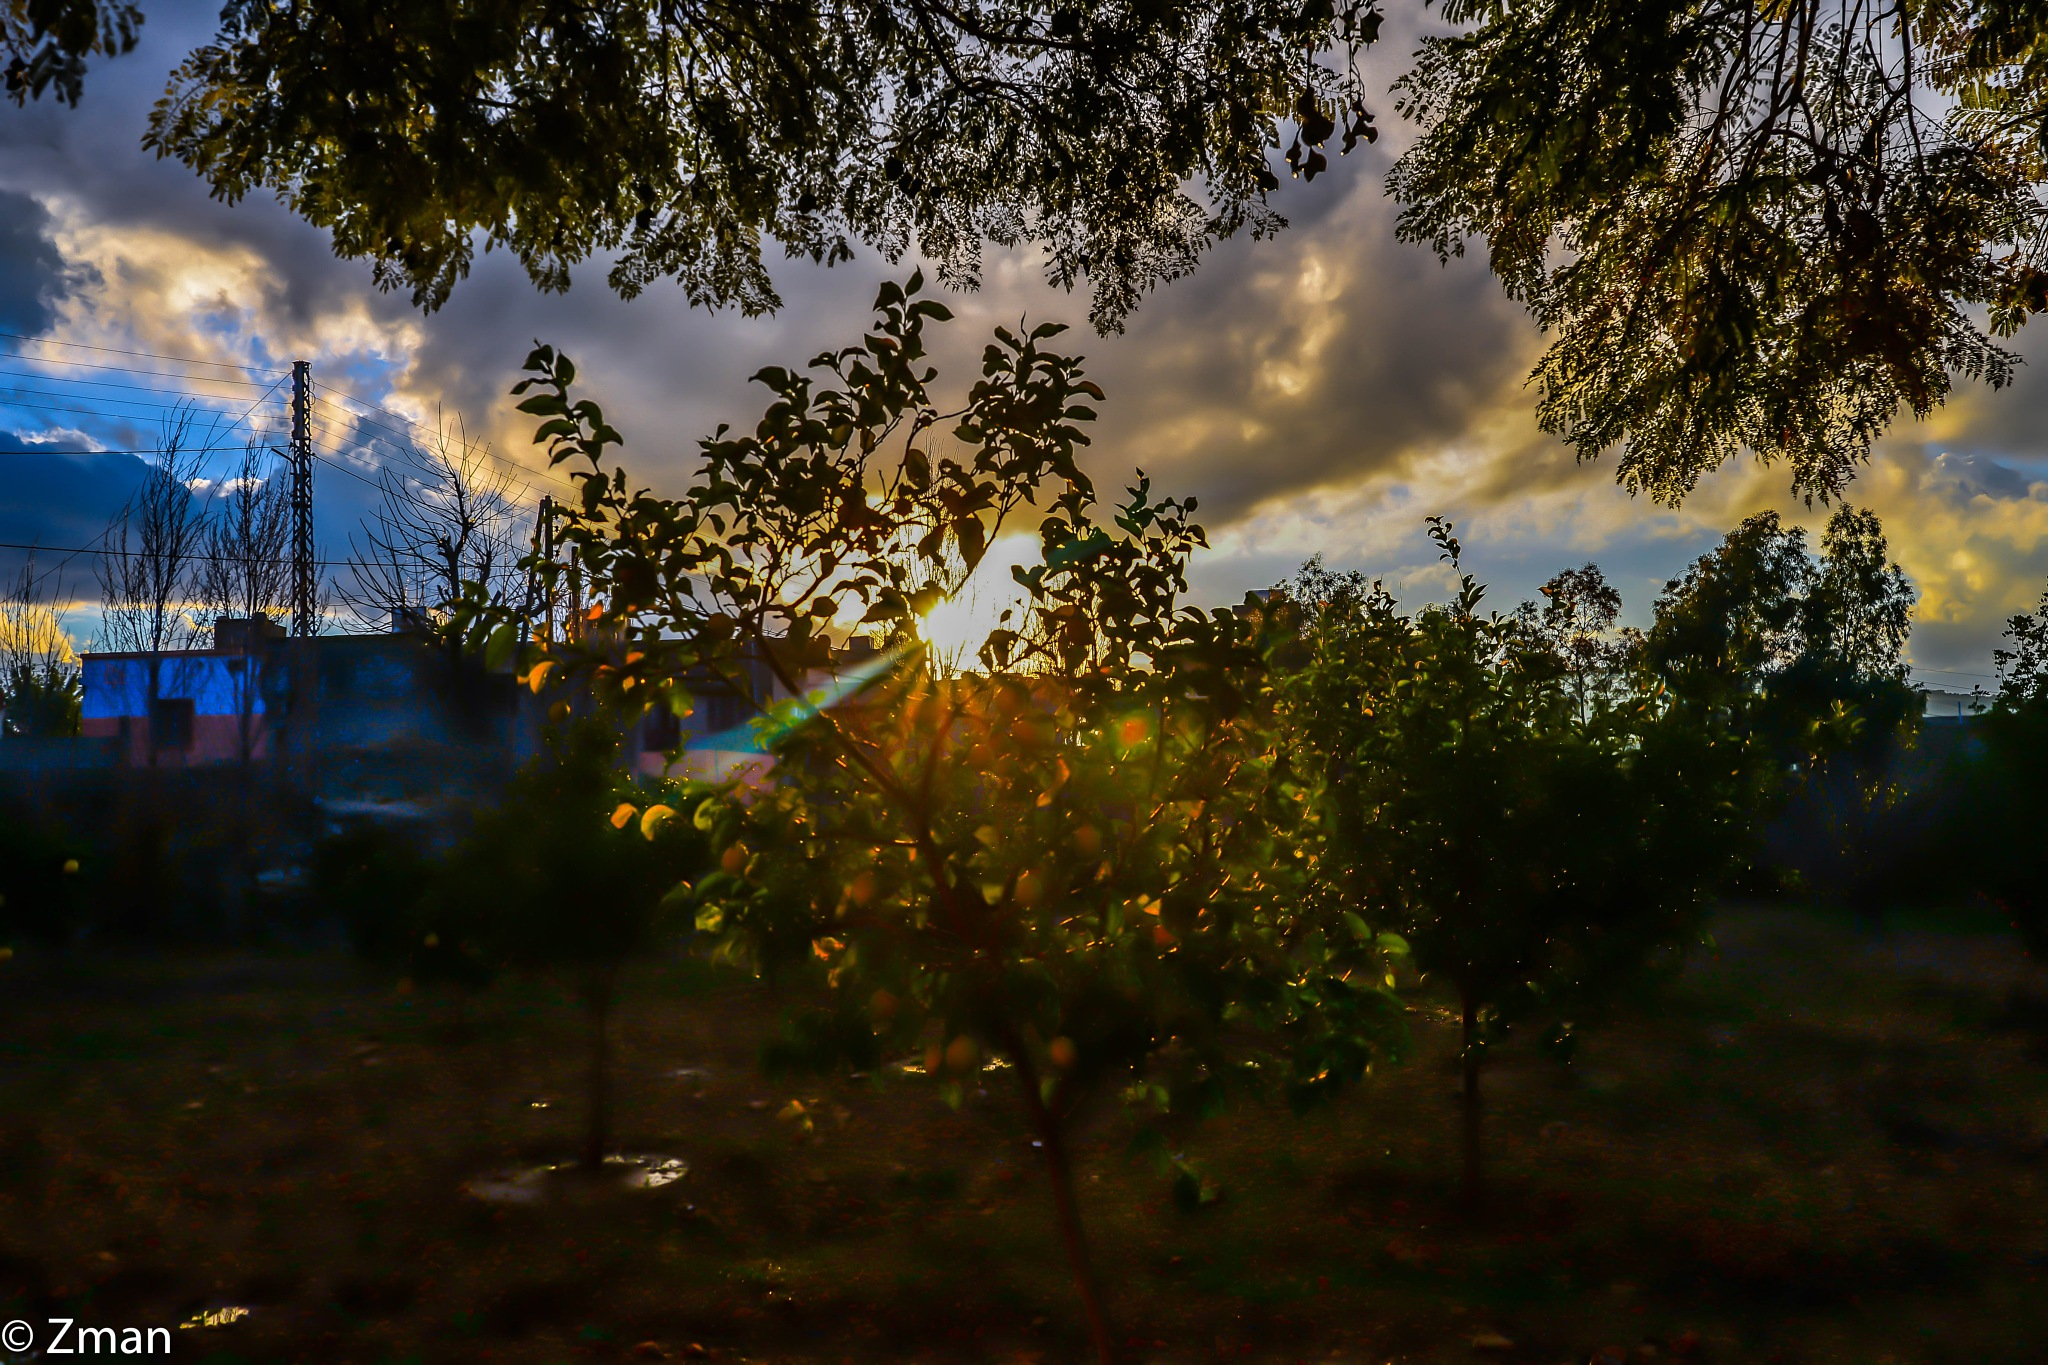 Lemon Tree and Sunrays by muhammad.nasser.963